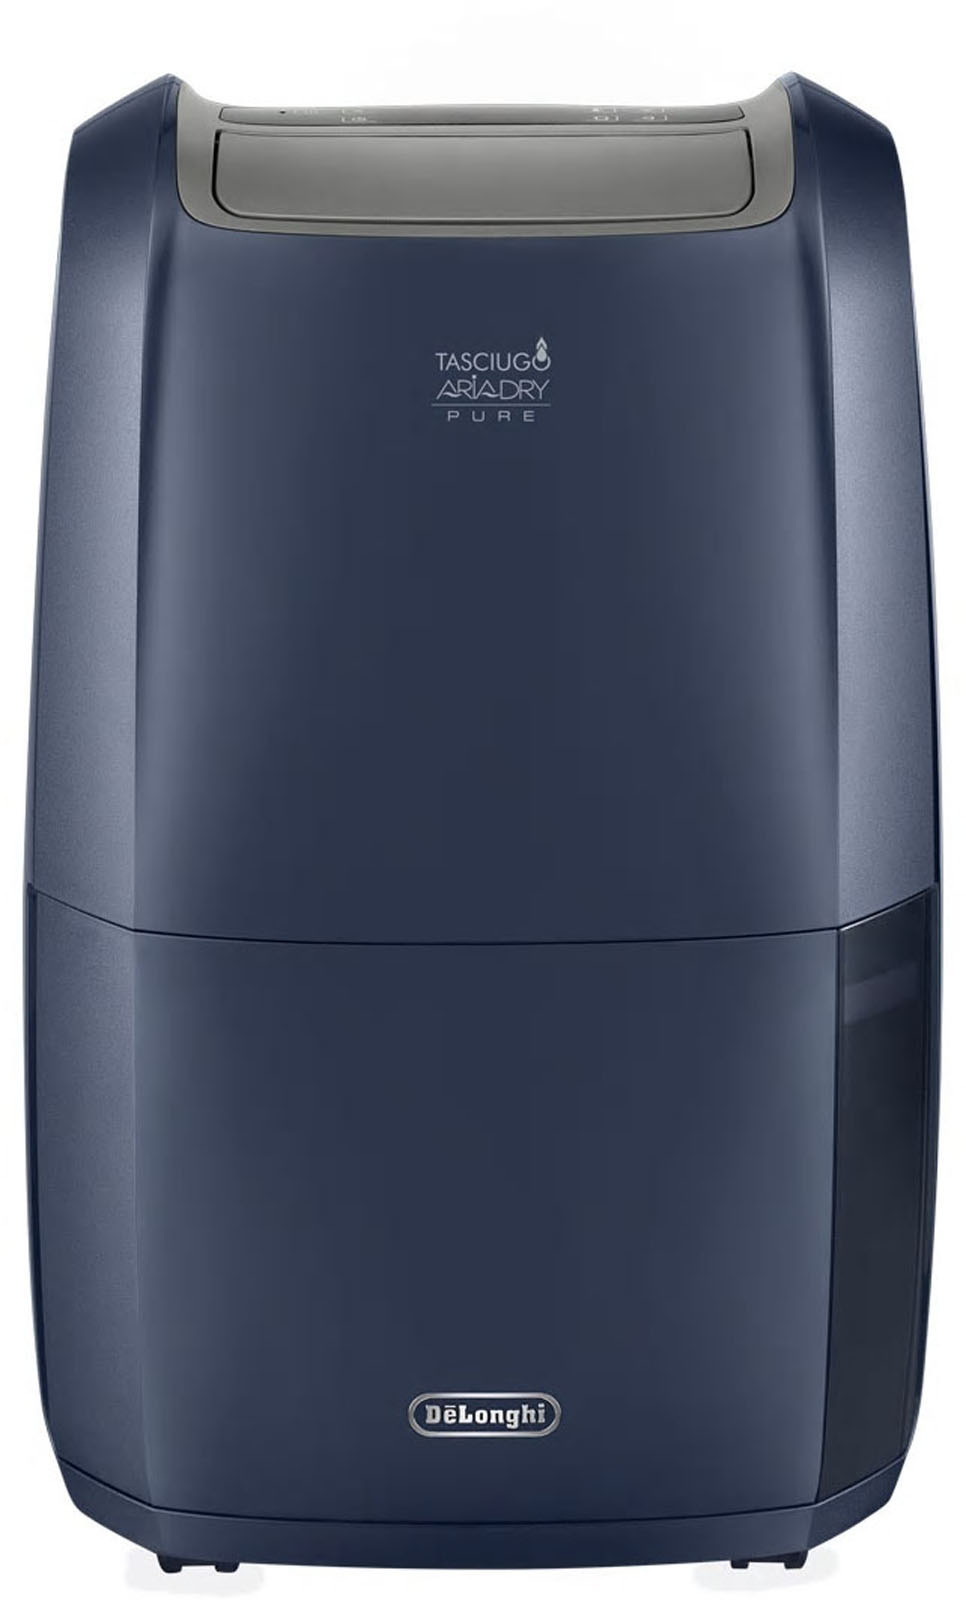 DeLonghi luchtontvochtiger Tasciugo AriaDry Pure DDSX220WF - Prijsvergelijk